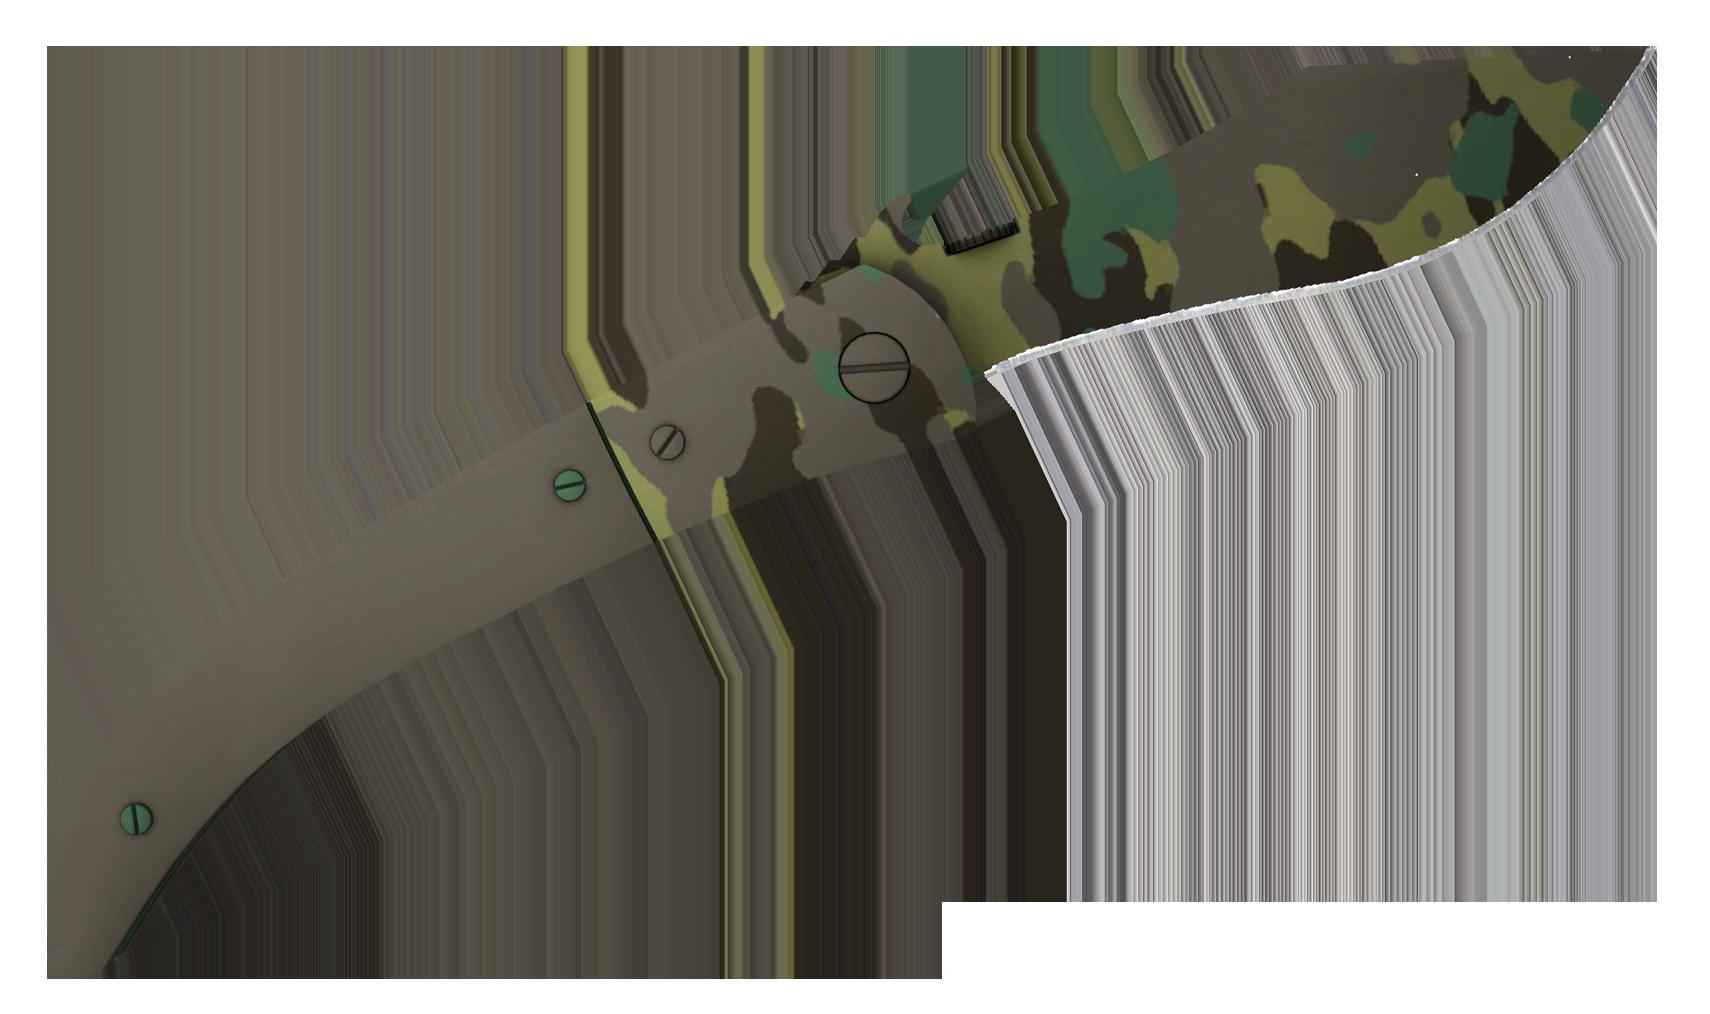 Navaja Knife Boreal Forest Large Rendering